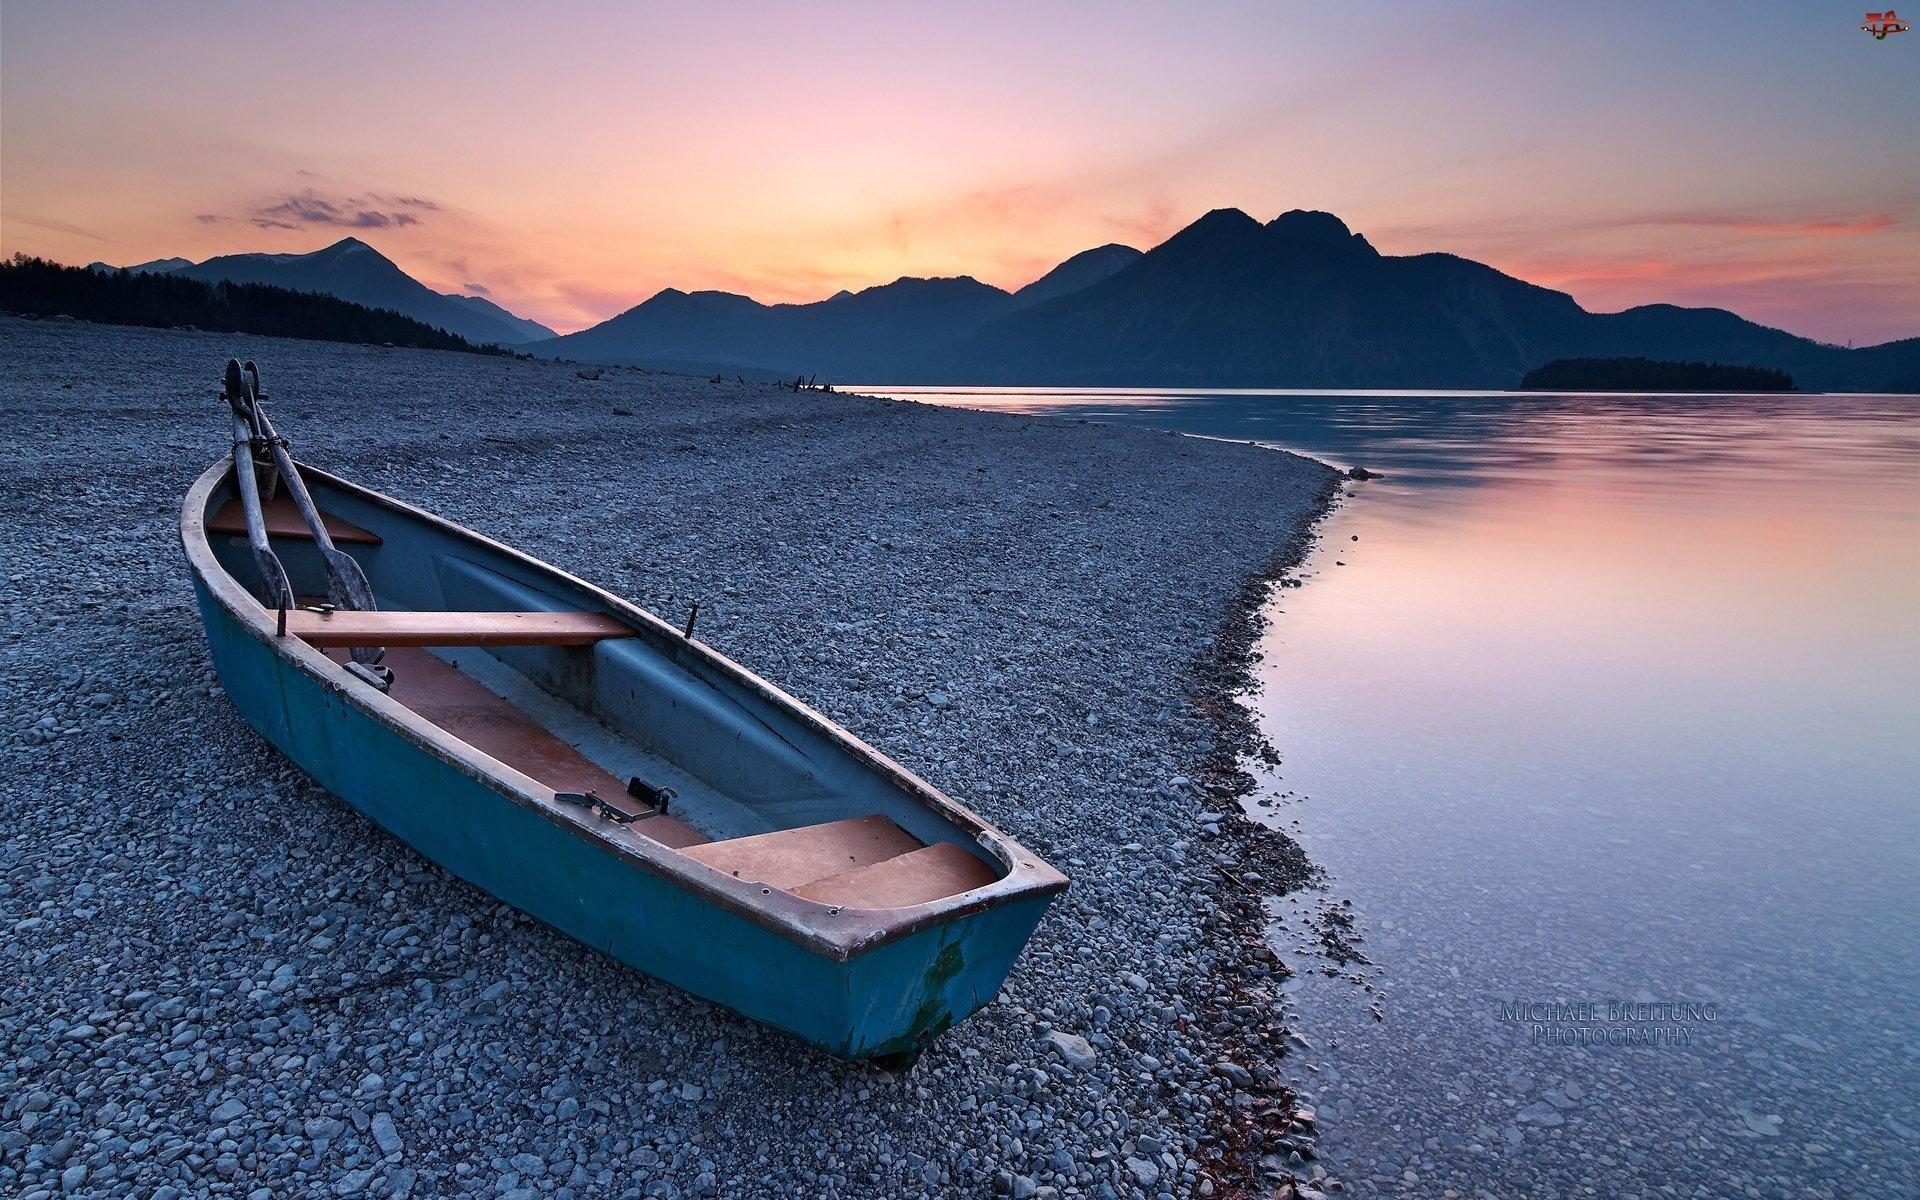 Łódka, Jezioro, Góry